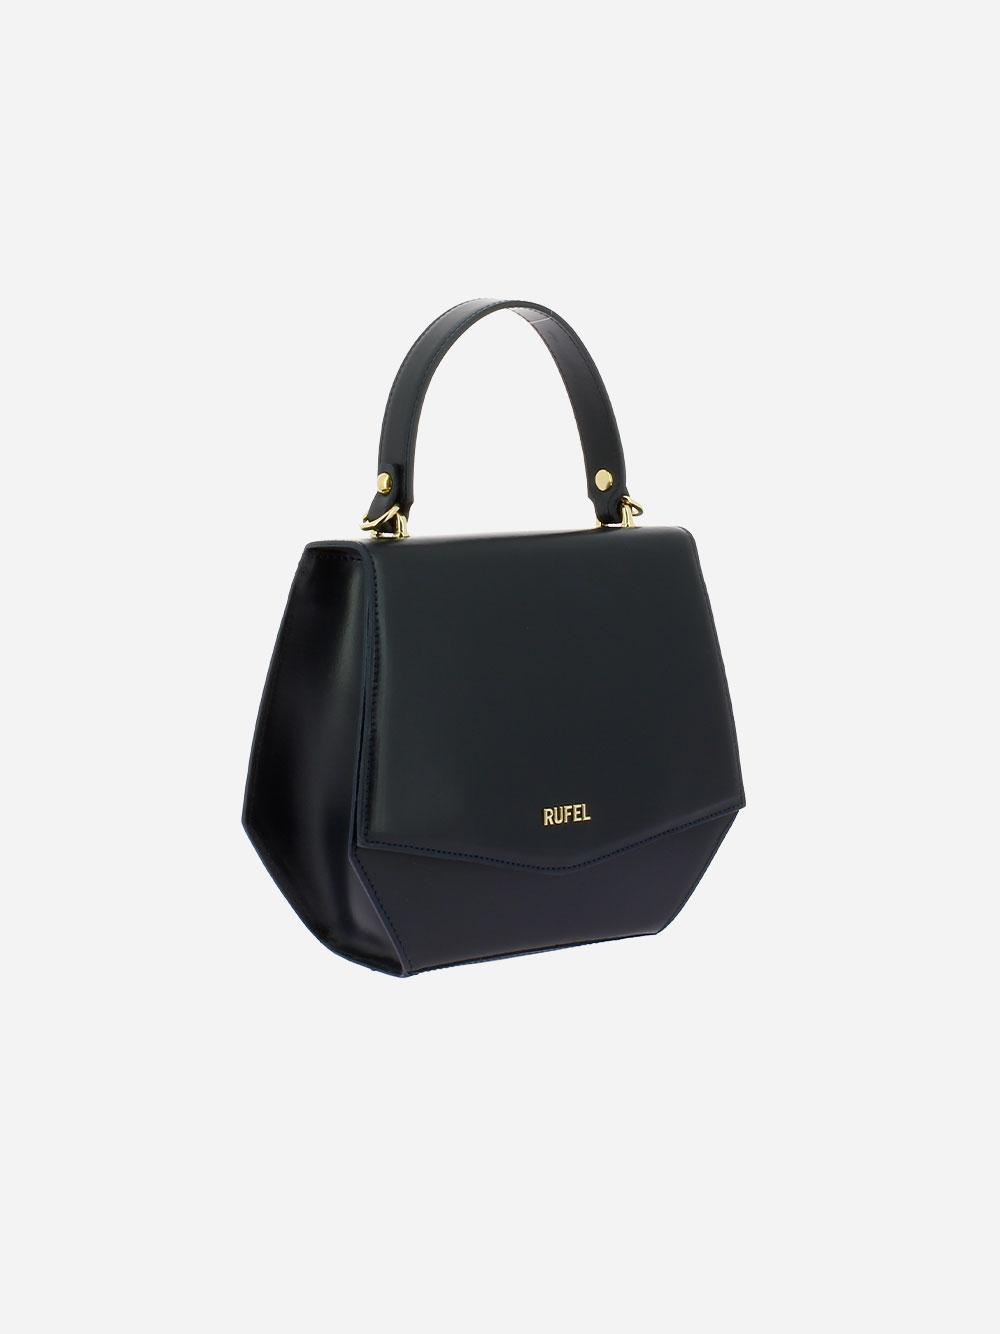 Soave Black Handbag